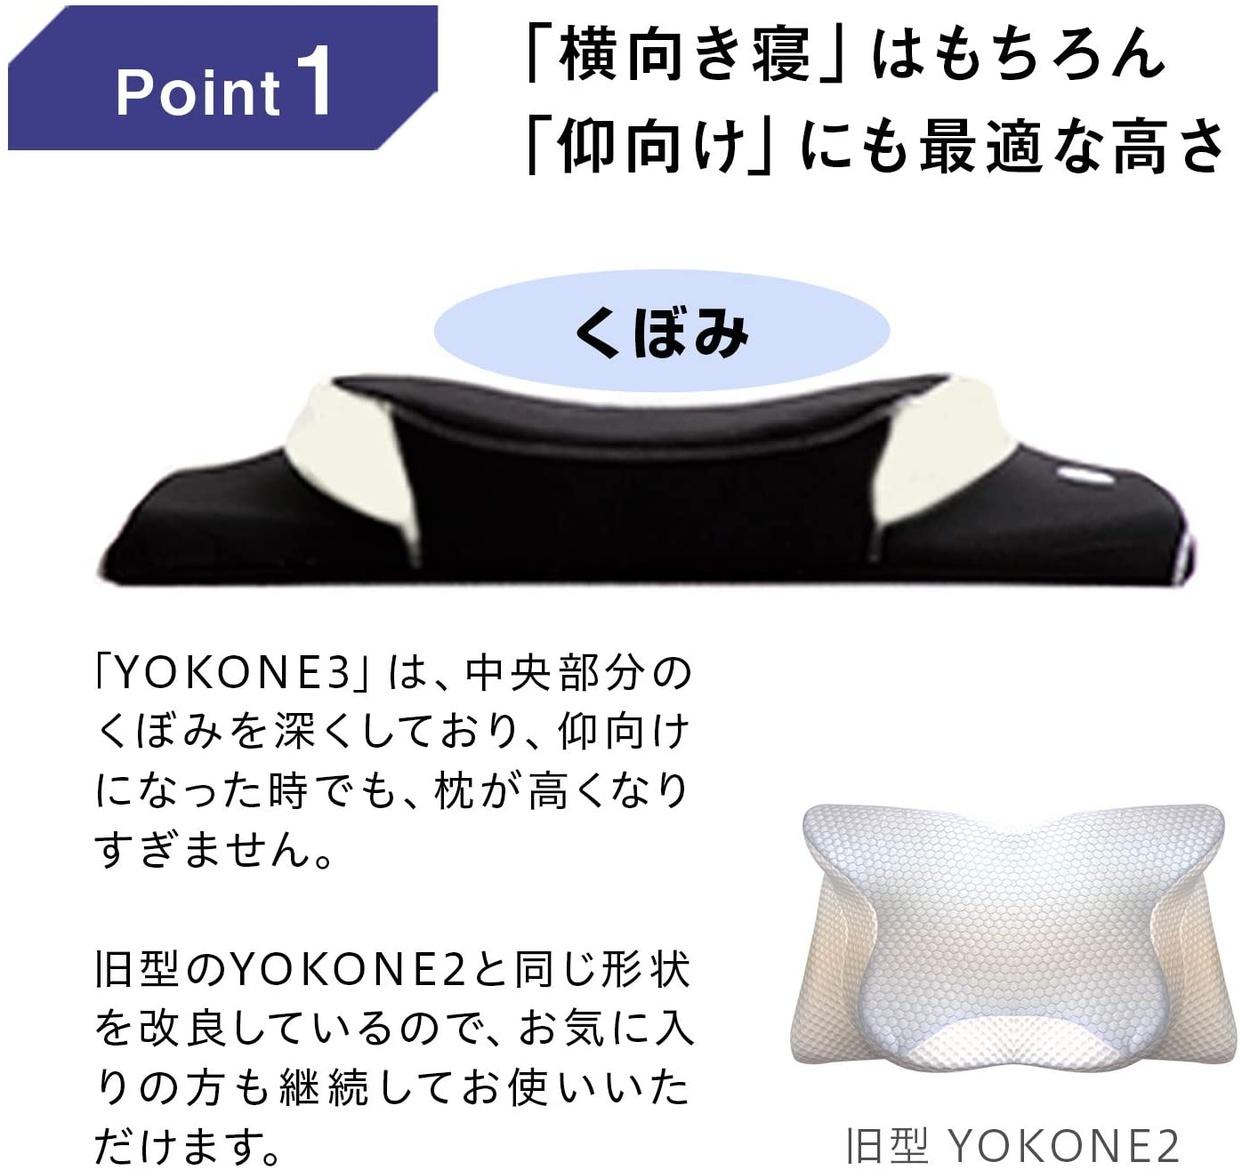 Moonmoon(ムーンムーン) YOKONE3の商品画像6